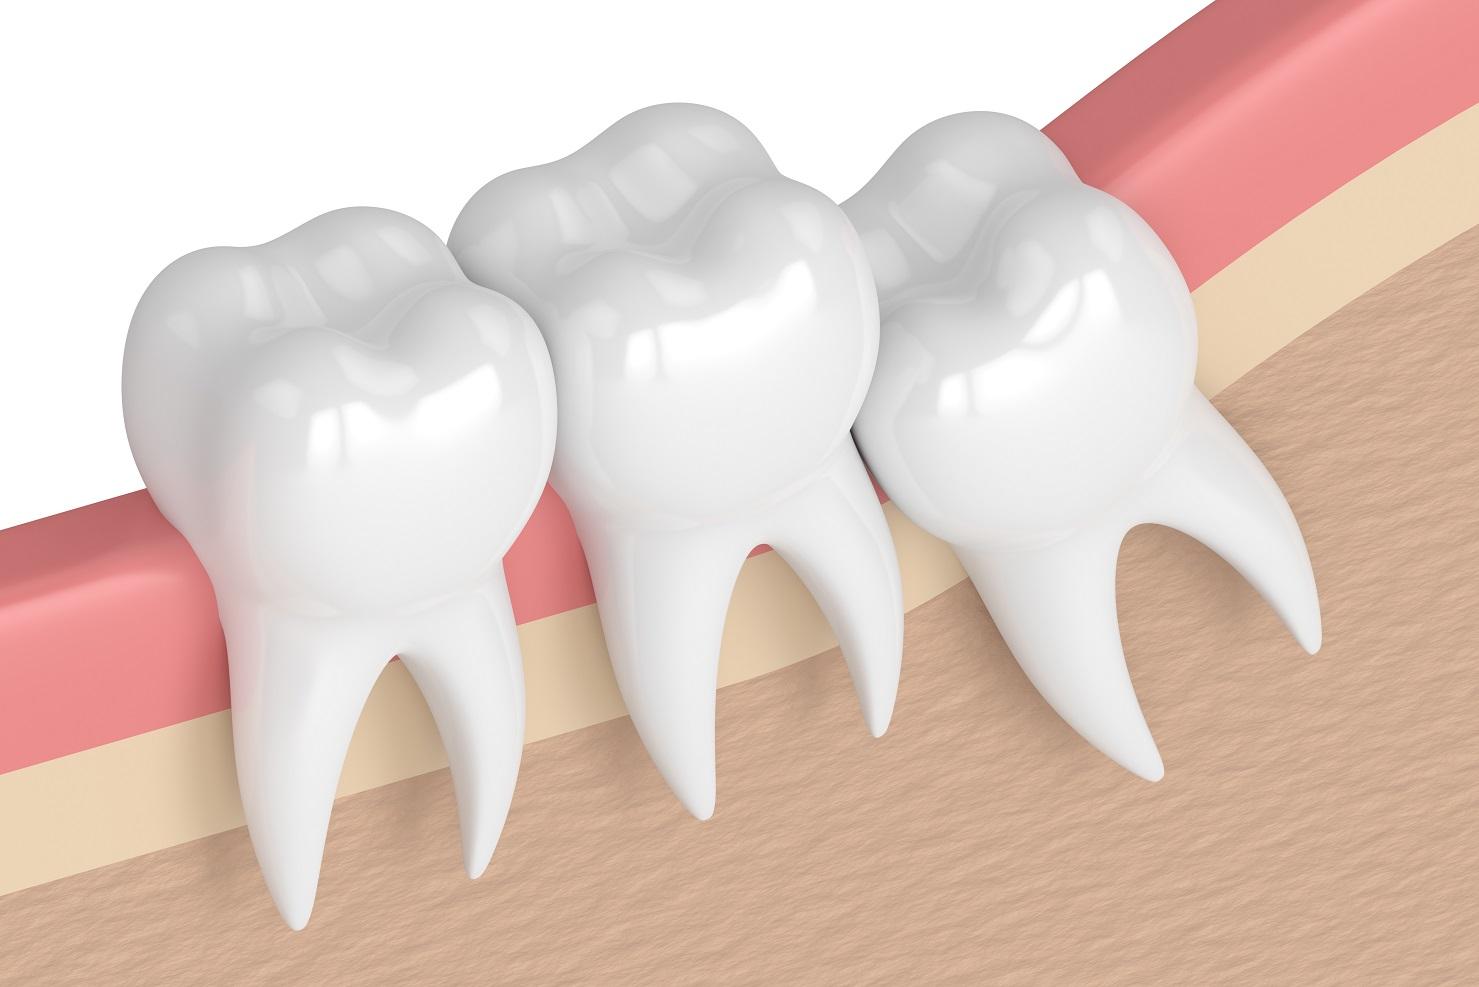 Address Your Wisdom Teeth As Soon As They Grow In